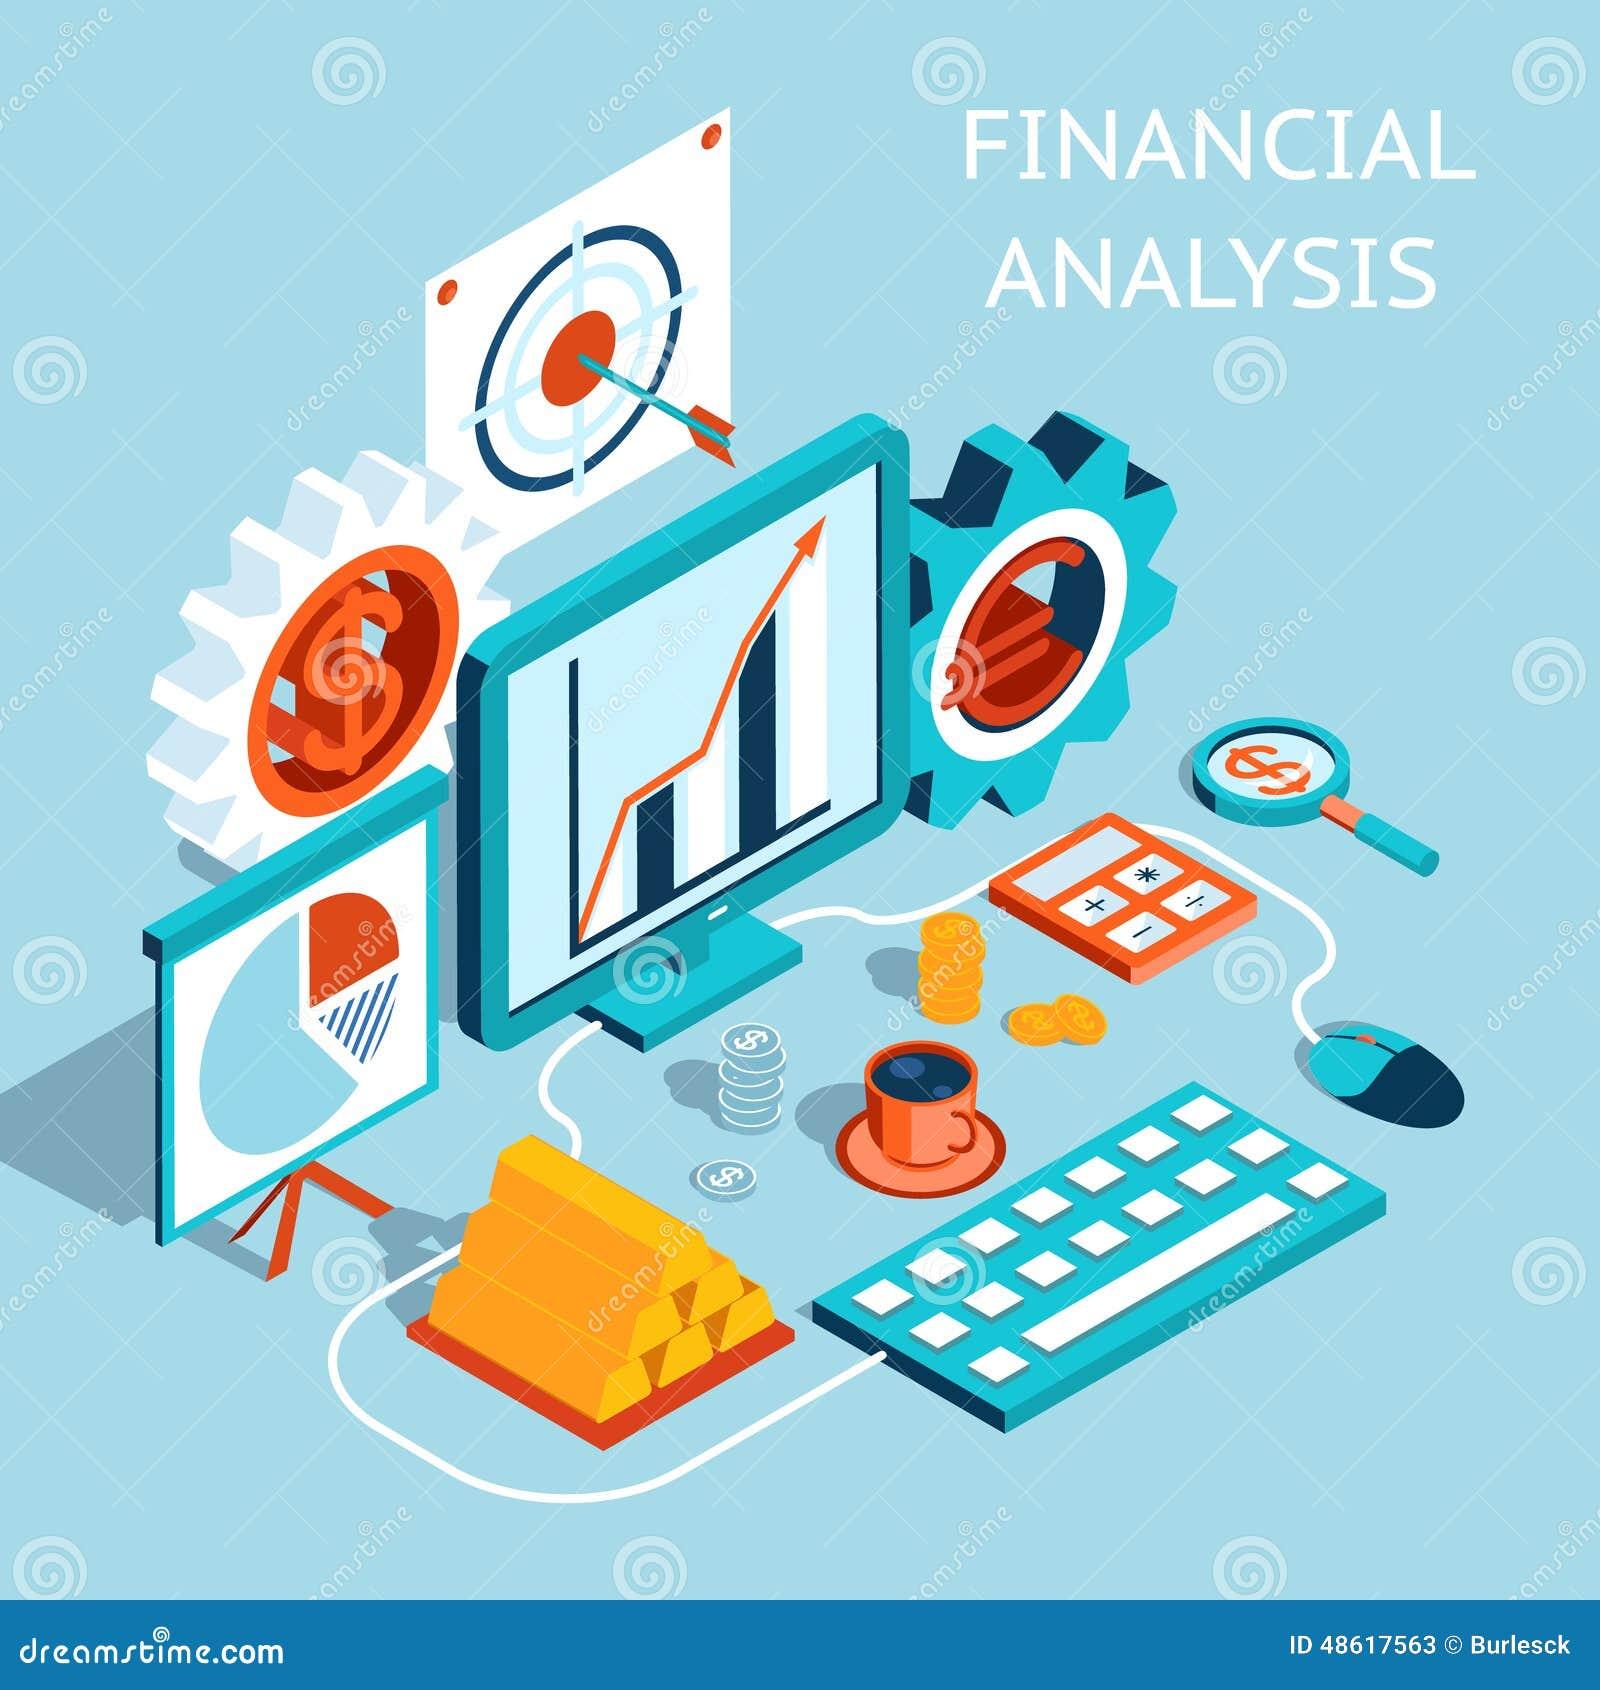 Finance Background: Vector 3D Financial Analysis Concept Design Stock Vector